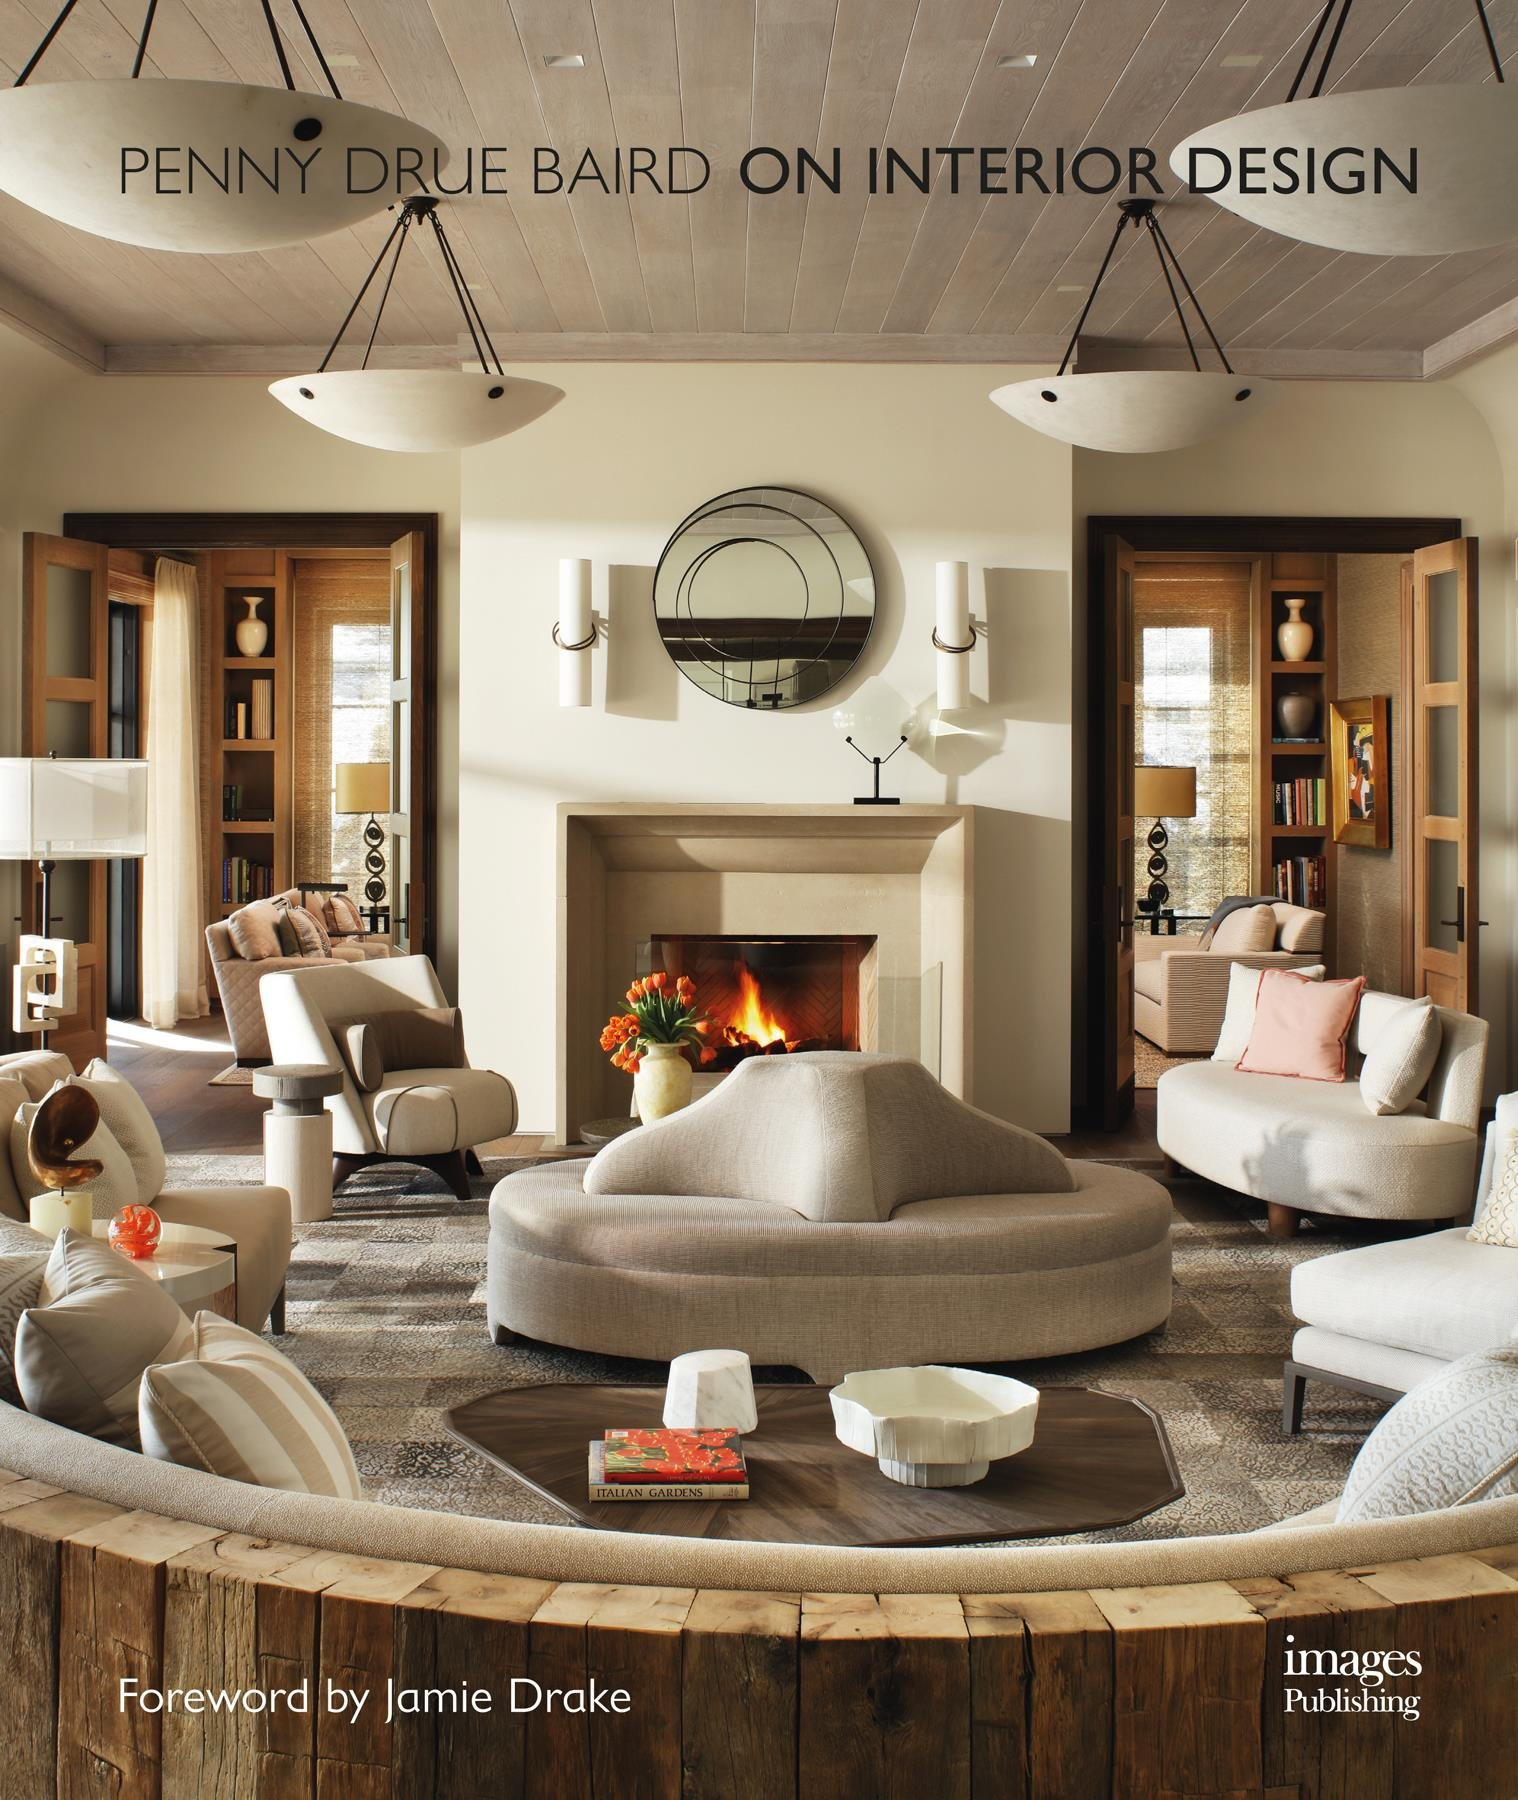 Amazoncom On Interior Design 9781864707847 Penny Drue Baird Books